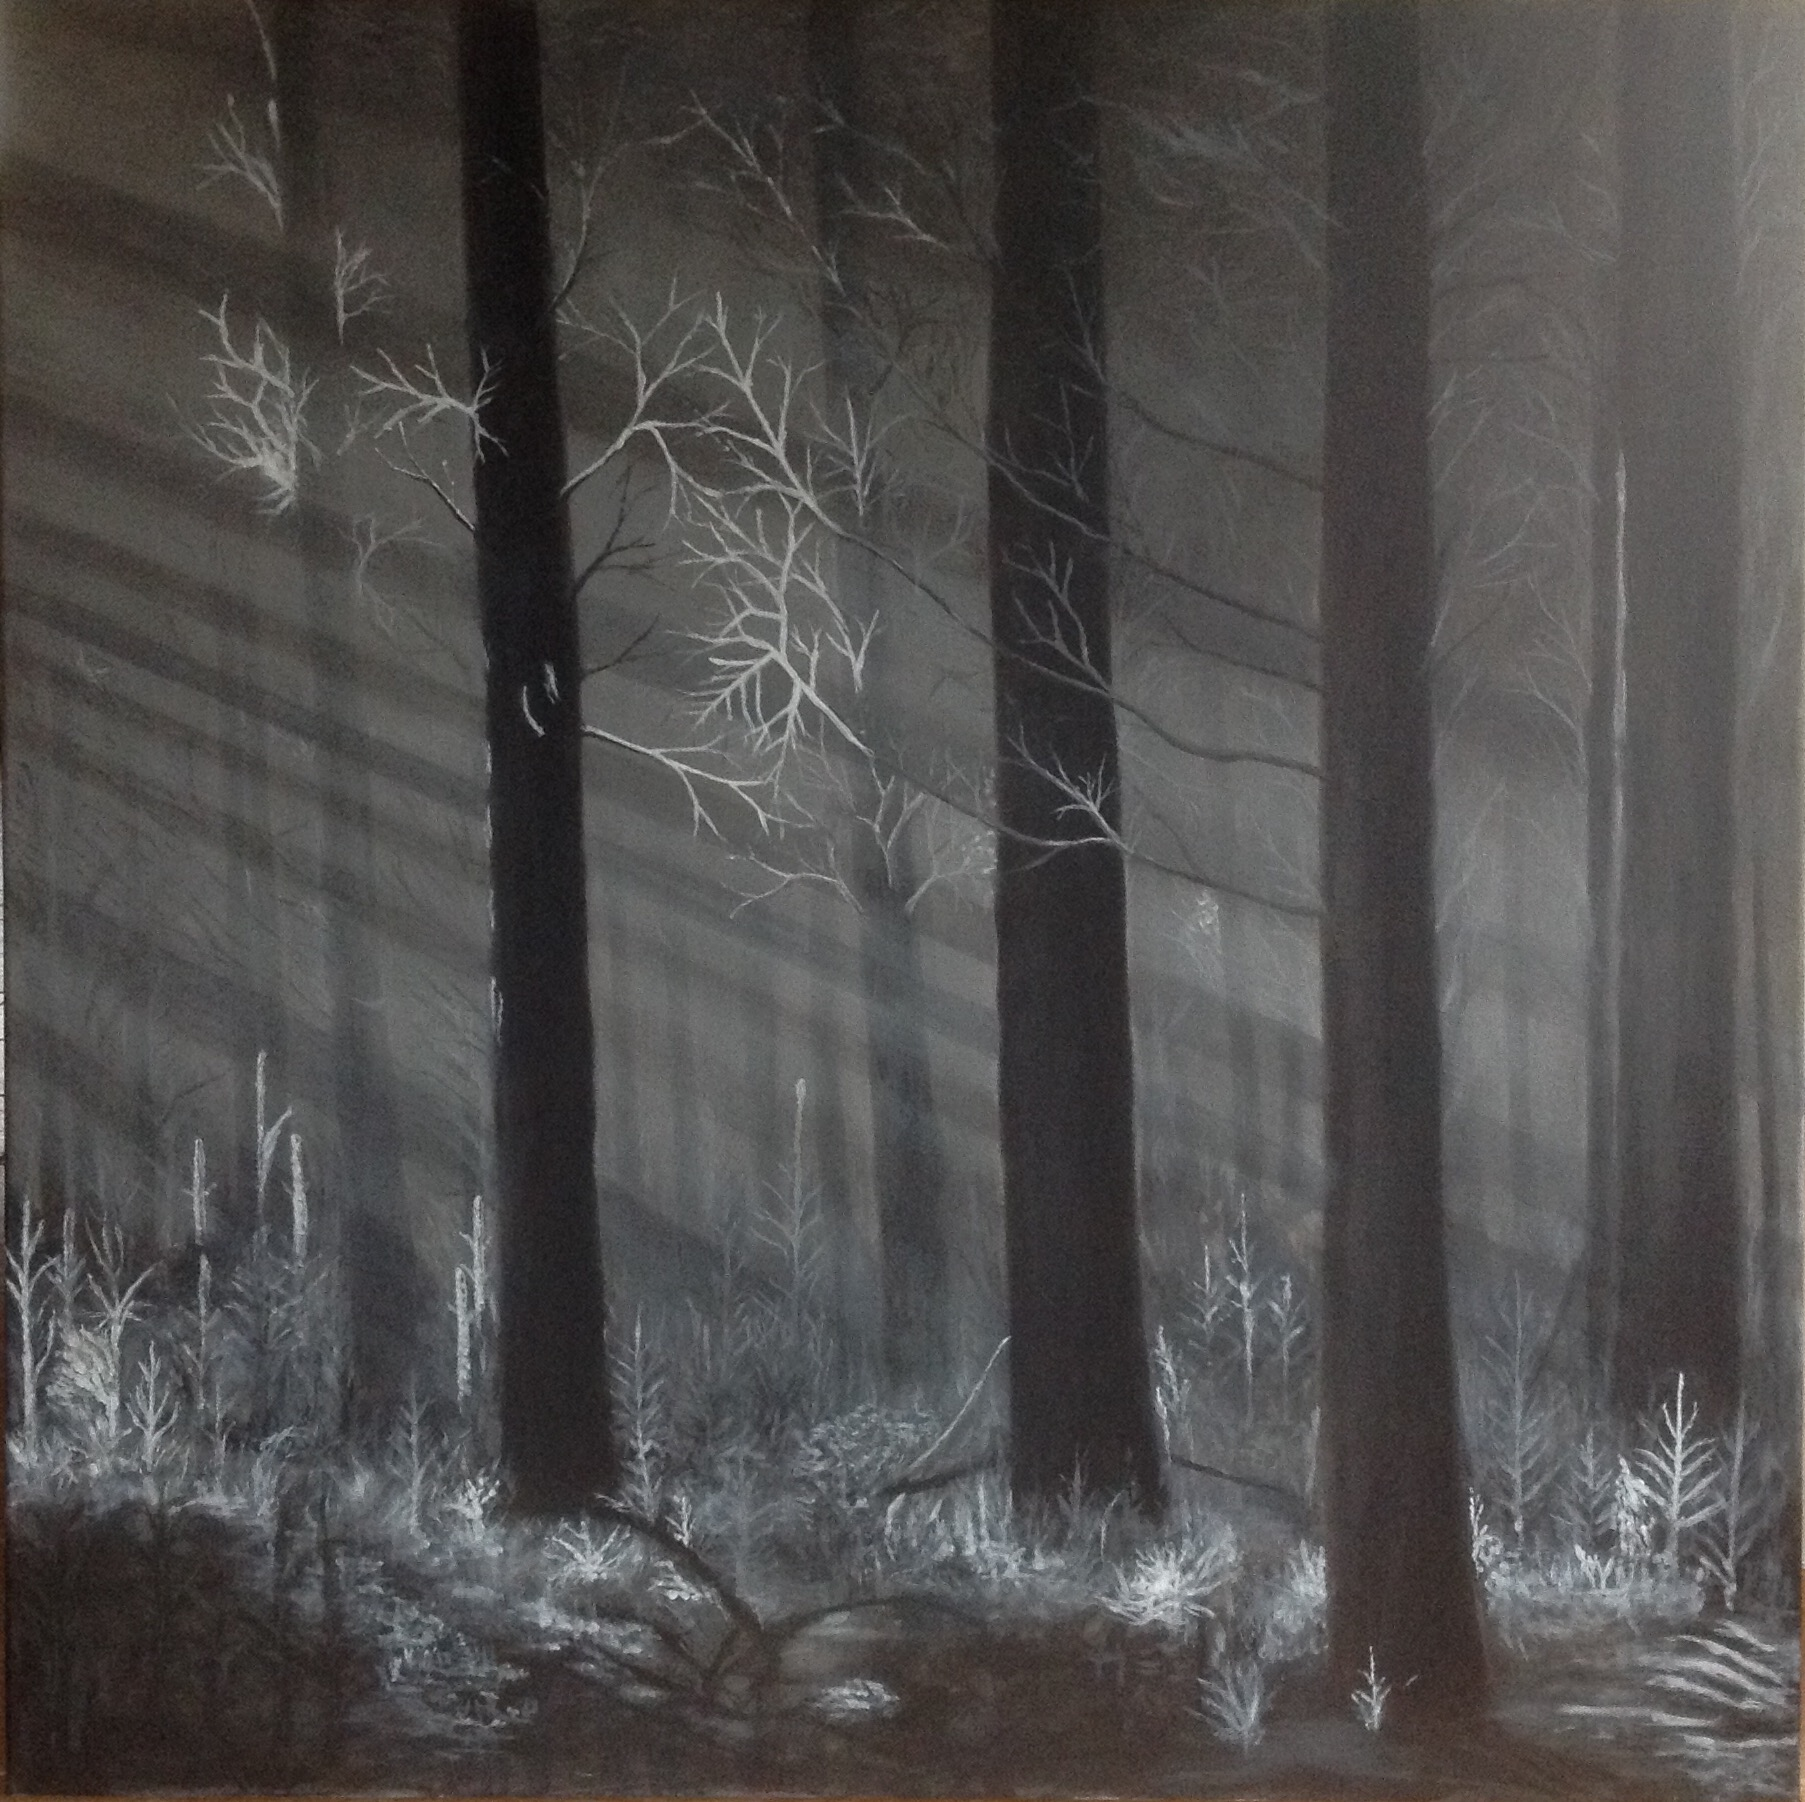 Winterzon, Acryl op linnen, 100 x 100 cm.